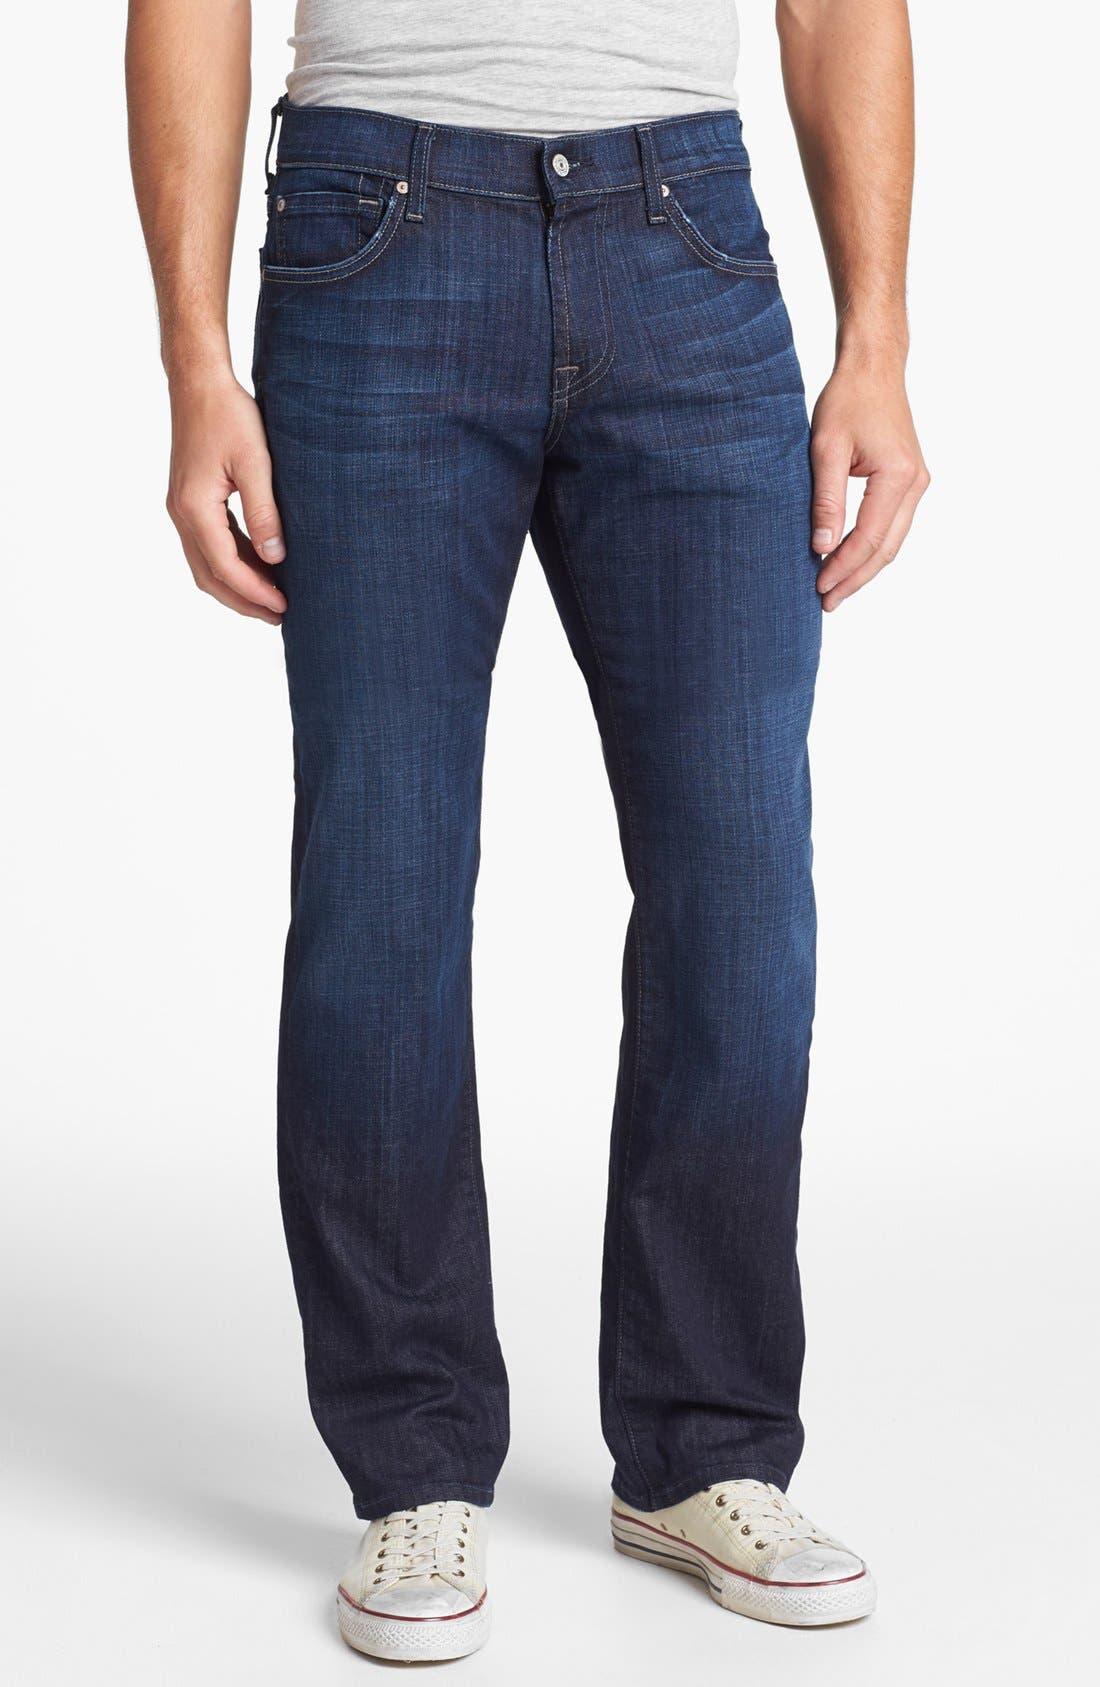 Austyn Relaxed Straight Leg Jeans,                             Main thumbnail 1, color,                             LOS ANGELES DARK